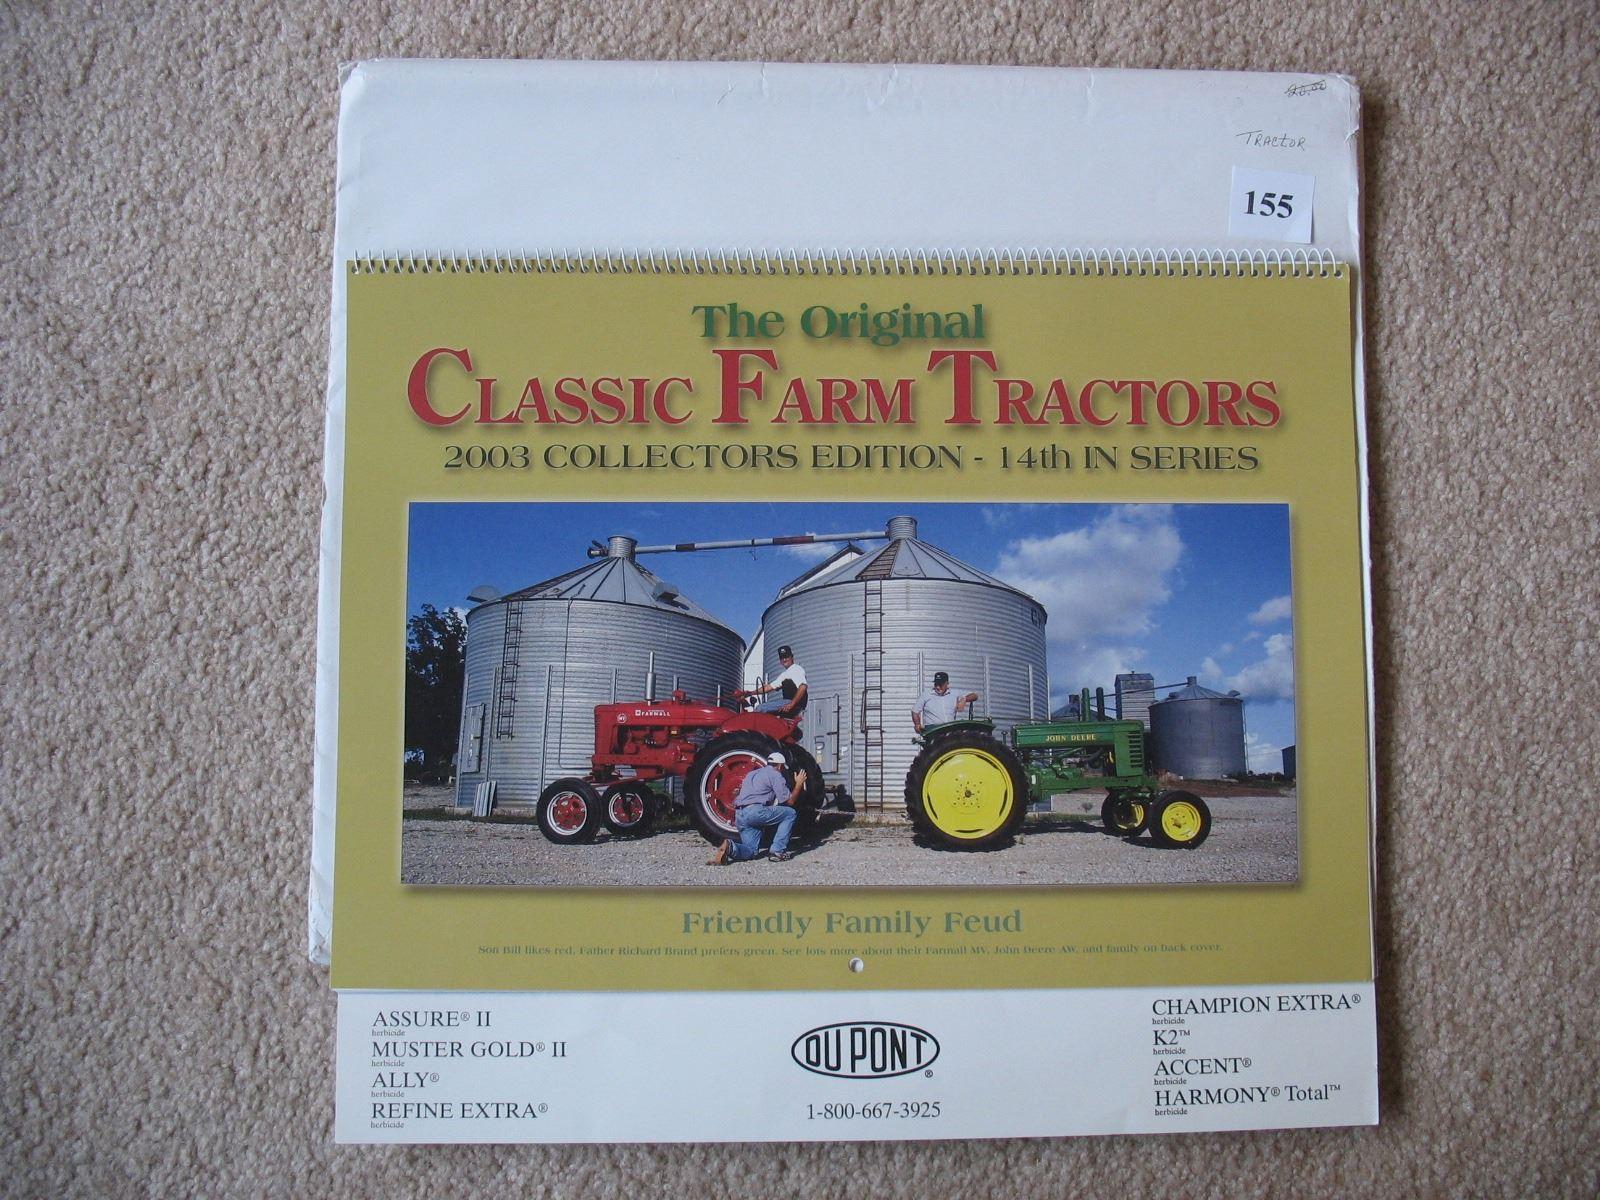 1998 & 2003 Dupont Vintage Tractor Calendars